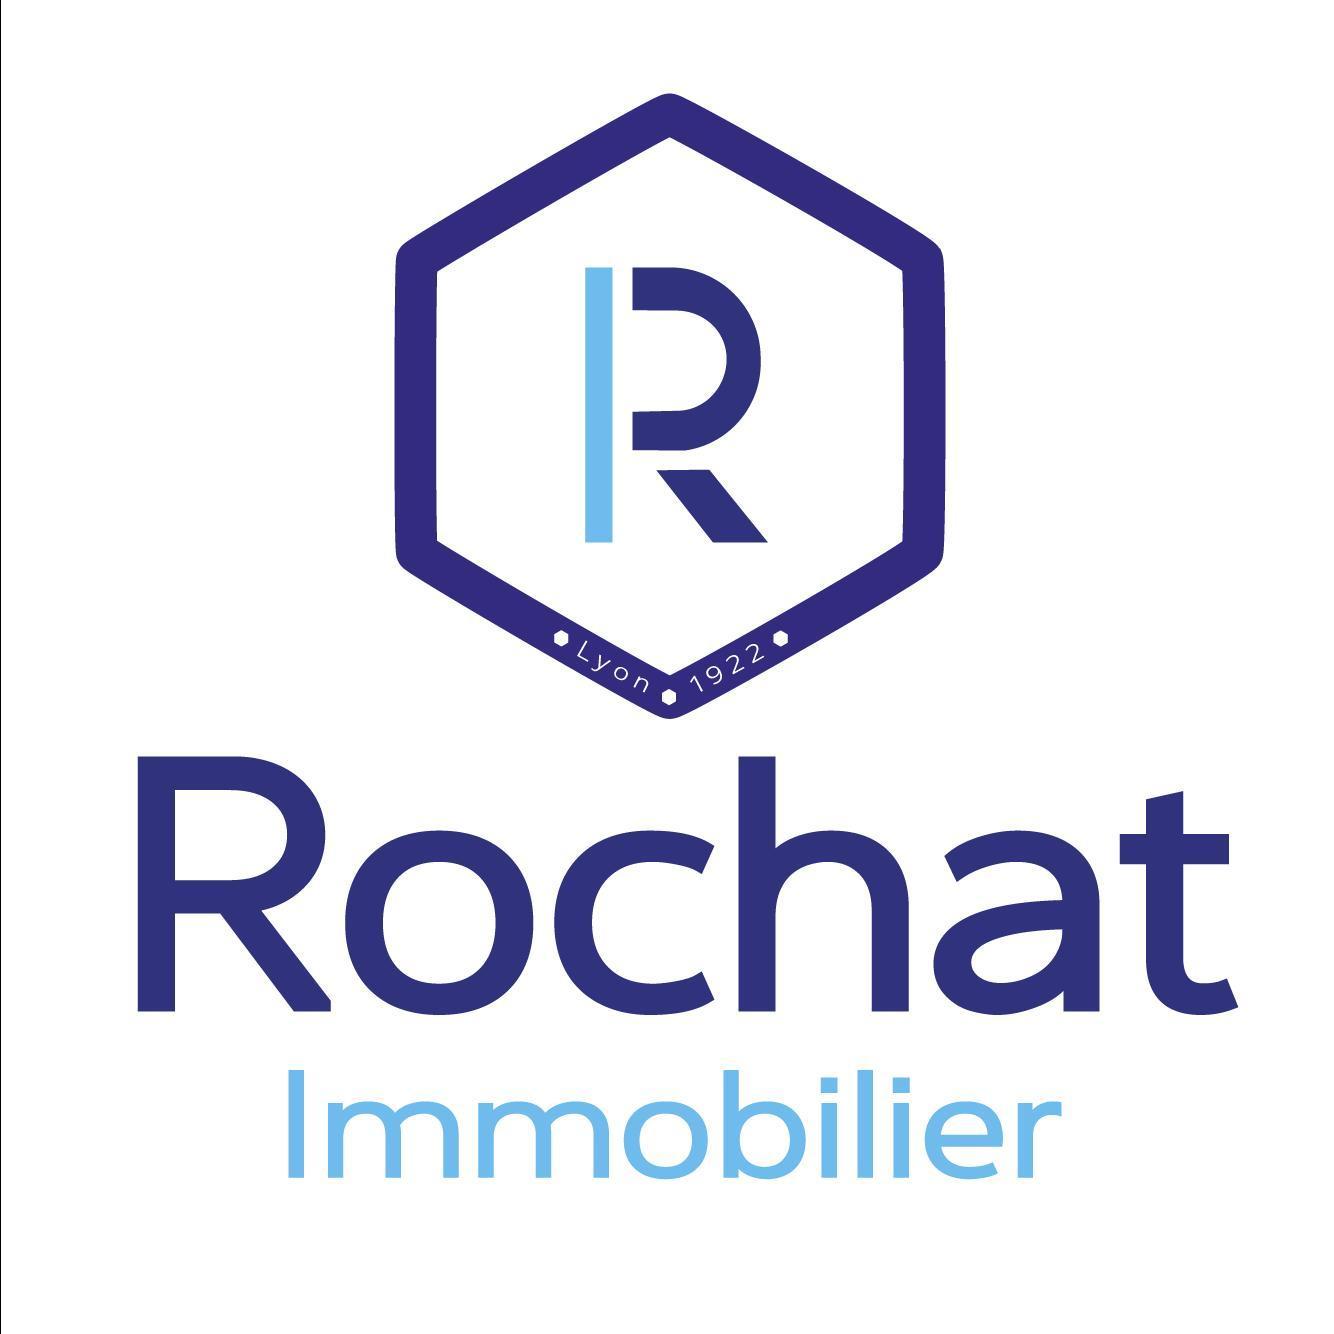 Rochat Immobilier agence immobilière Lyon 2 (69002)